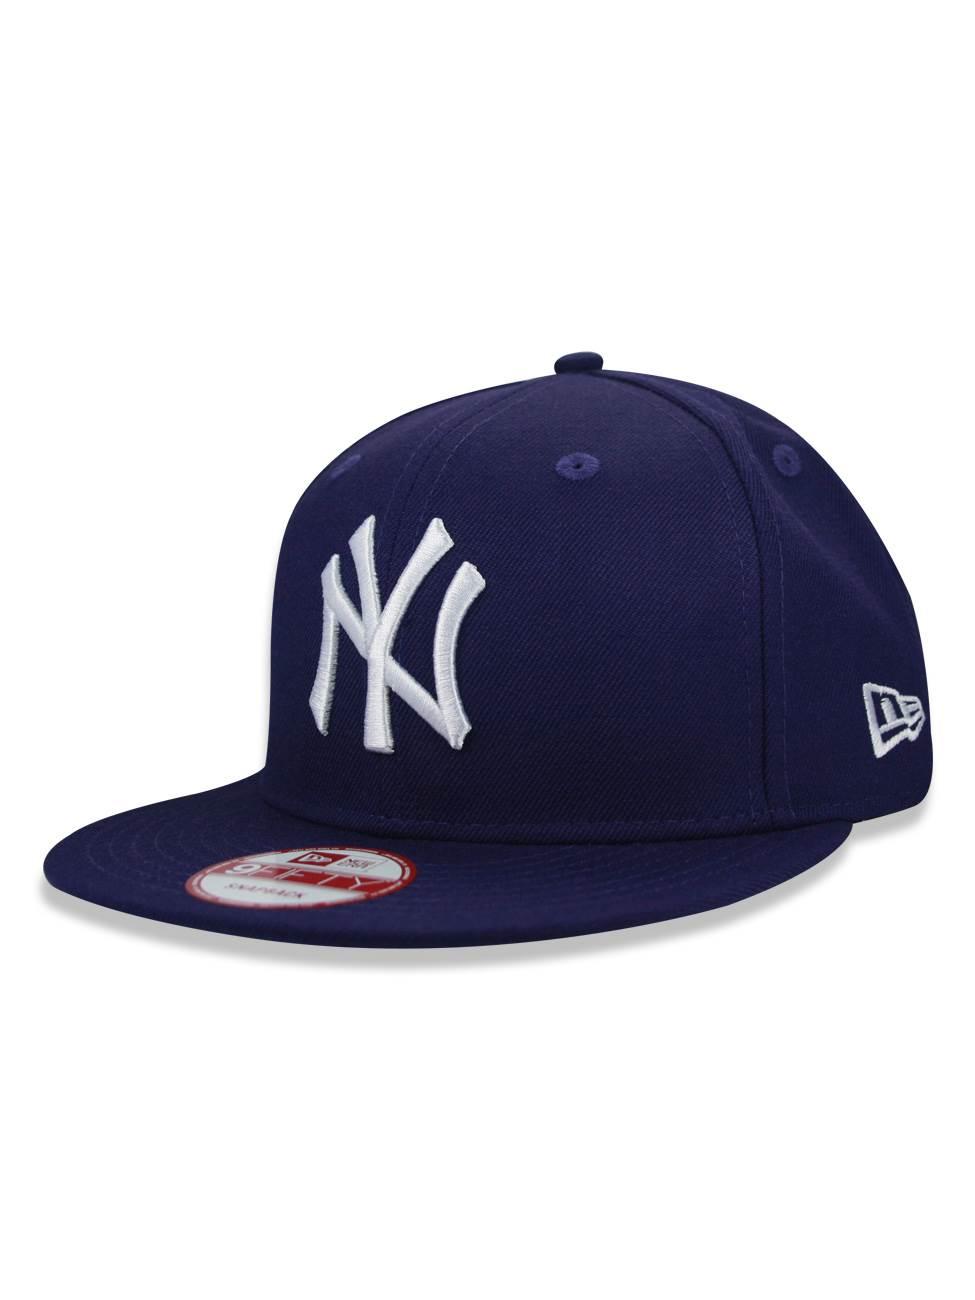 BONÉ NEW ERA MLB NEW YORK YANKEES ROXO